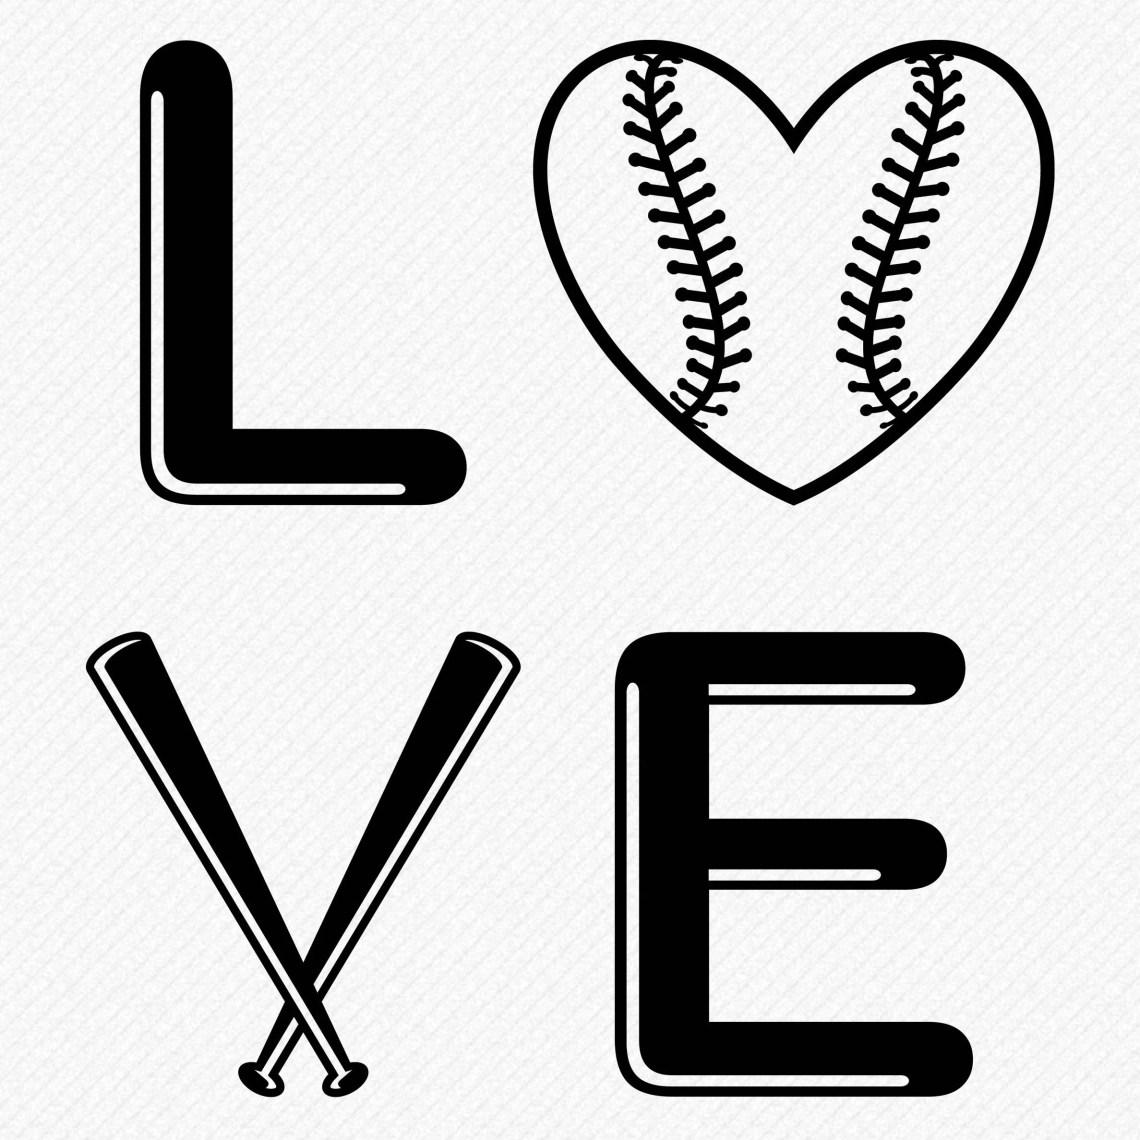 Download Love Baseball SVG, baseball words svg, love baseball ...